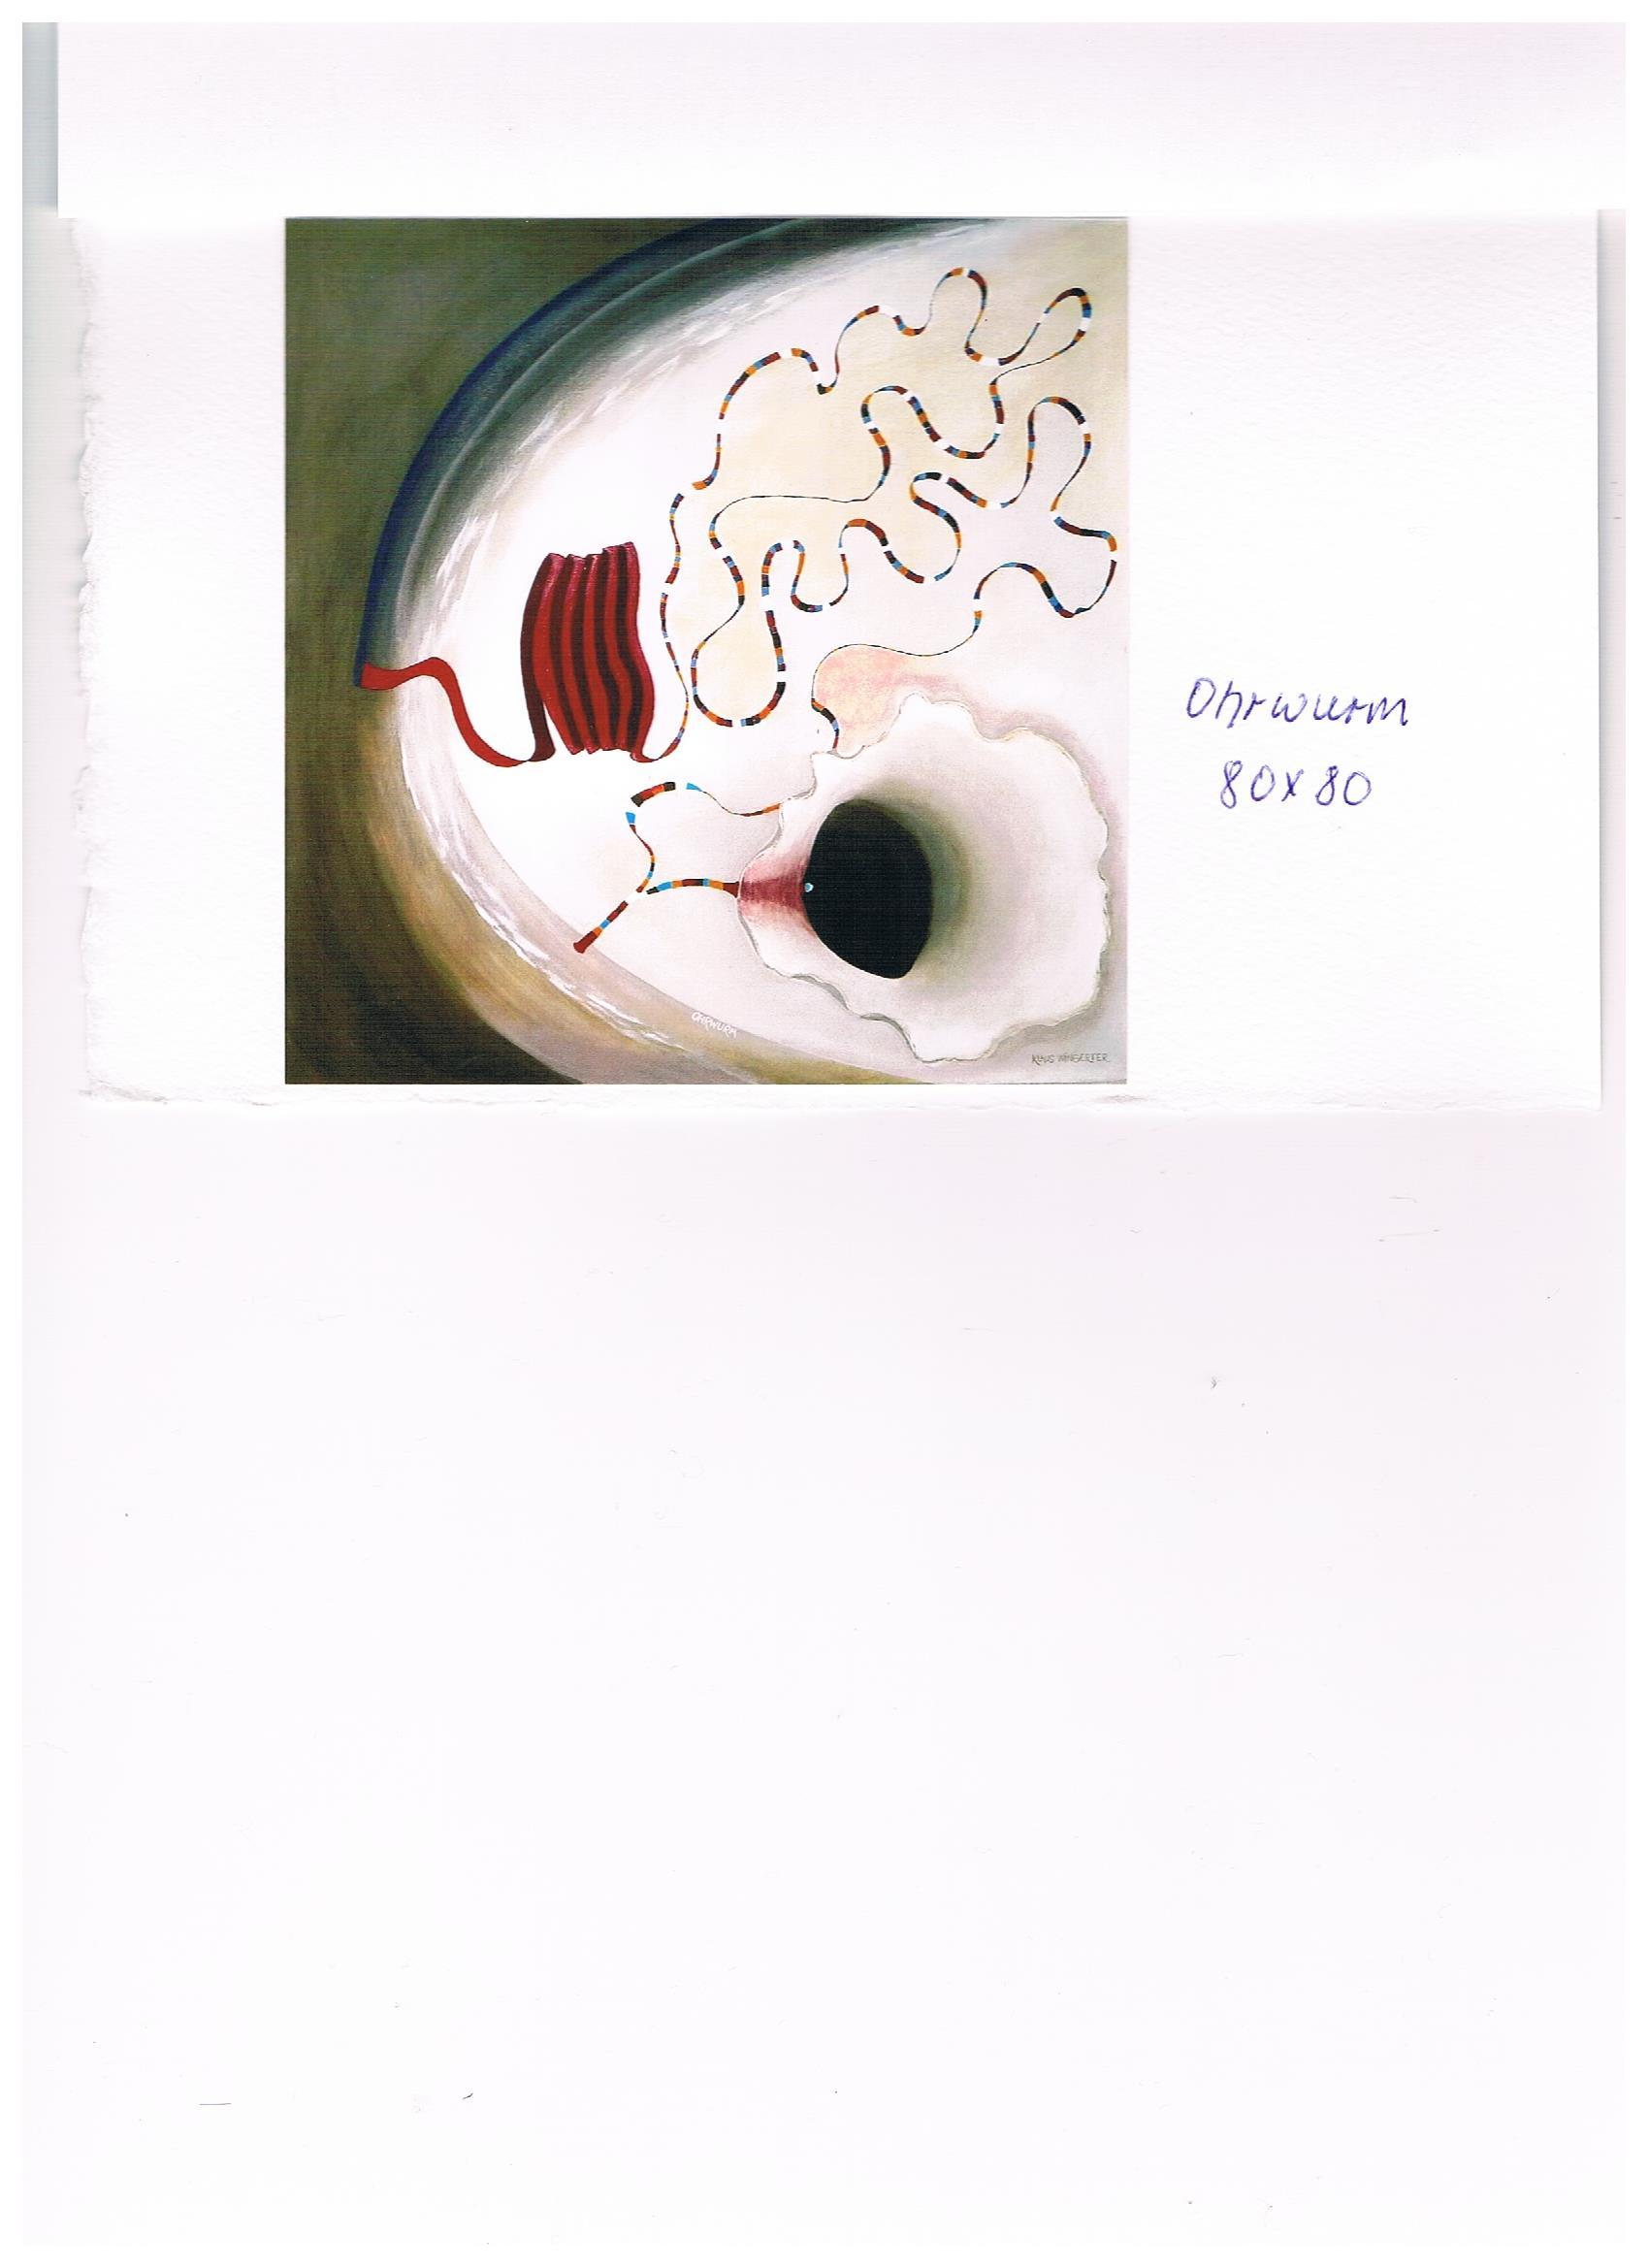 Ohrwurm 001 - Klaus Wingerter